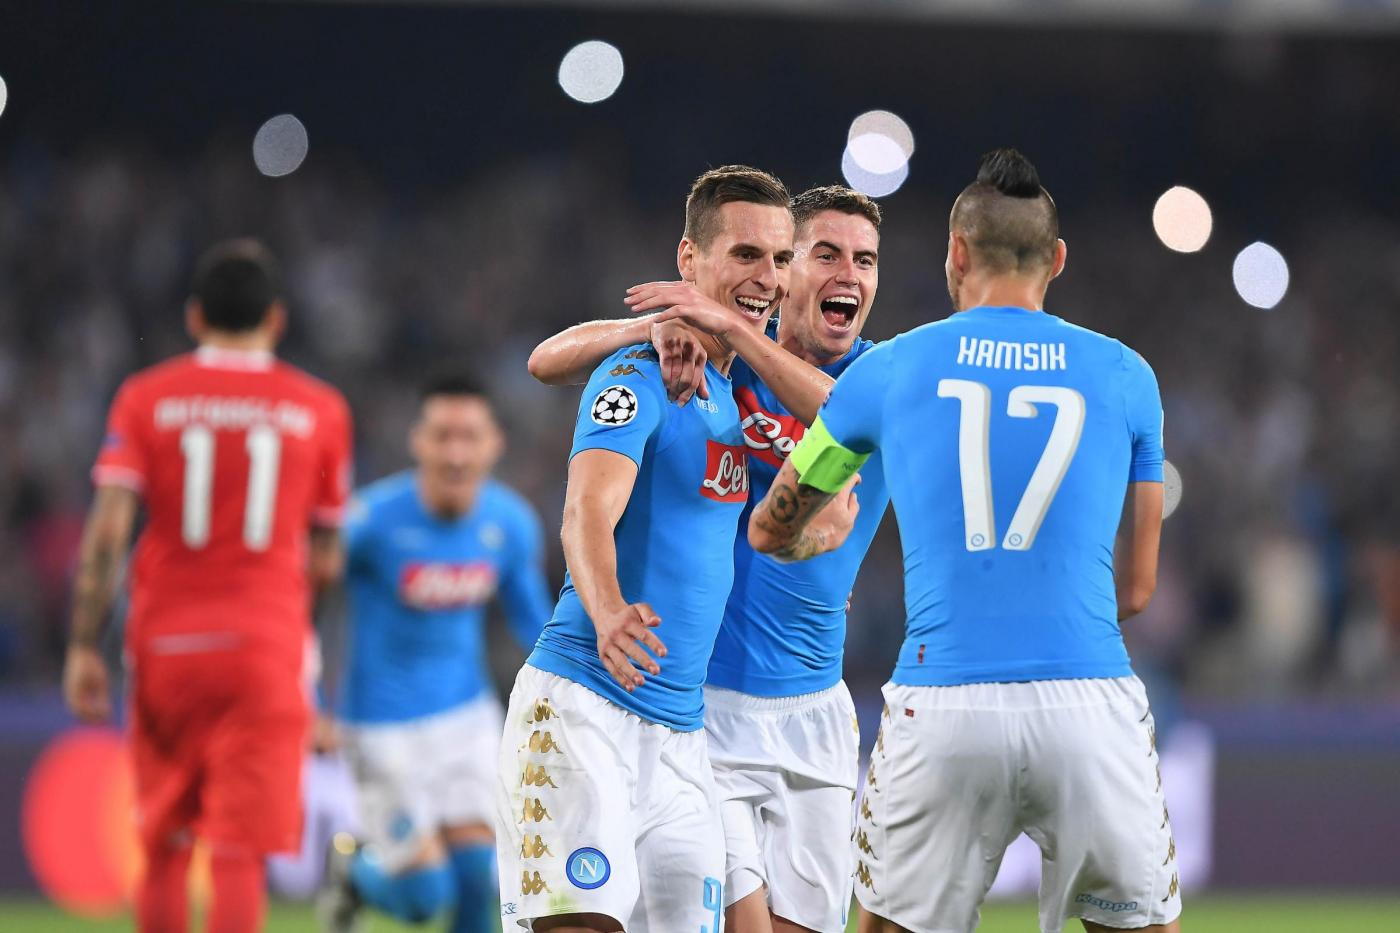 Ventiseiesima Serie A, Napoli-Atalanta: sfida per l'Europa!